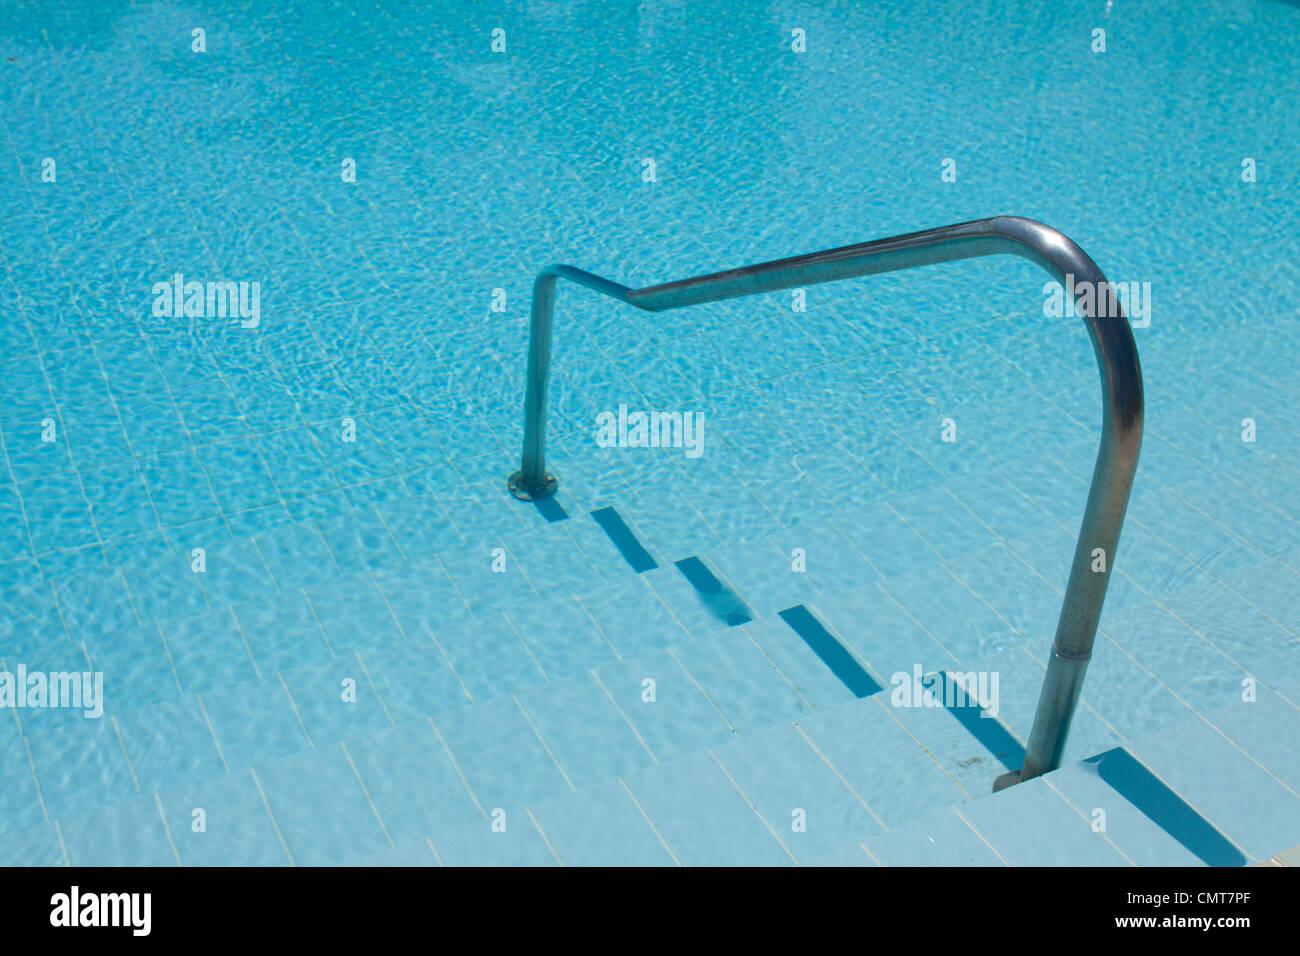 Swimming pool steps rail Stock Photo: 47246823 - Alamy